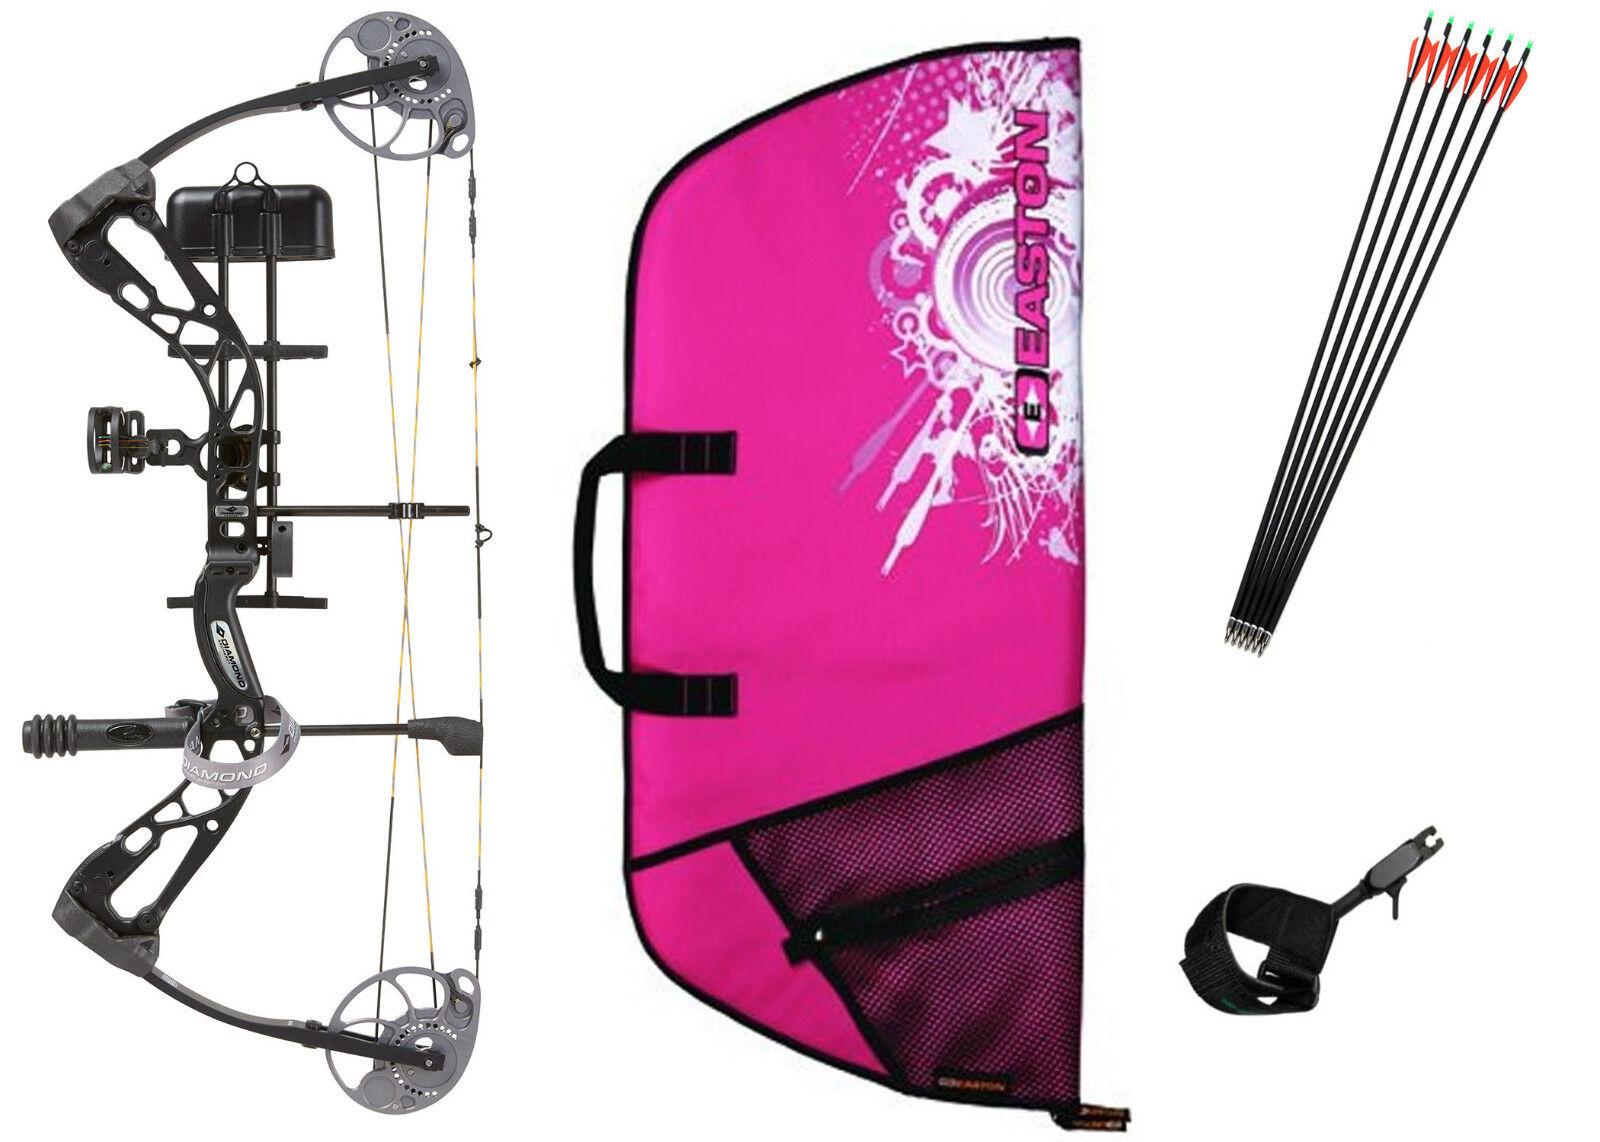 Diamond Bowtech Infinite Edge SB-1 BLACK & PINK Bow Package